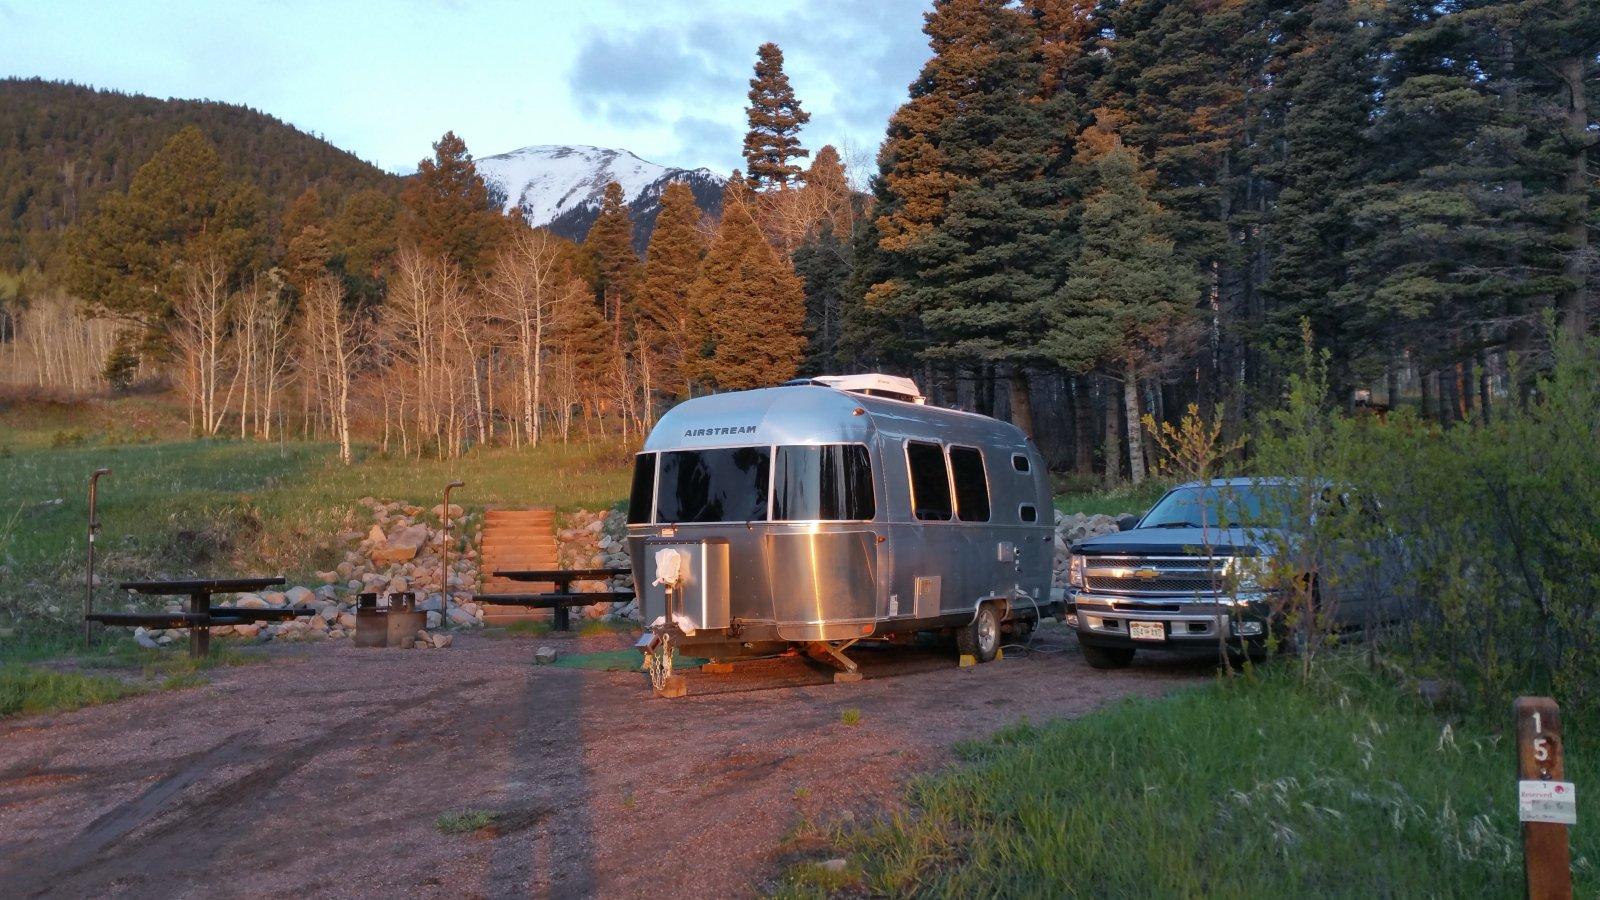 Click image for larger version  Name:Alvarado Campground 1.jpg Views:62 Size:318.6 KB ID:263425